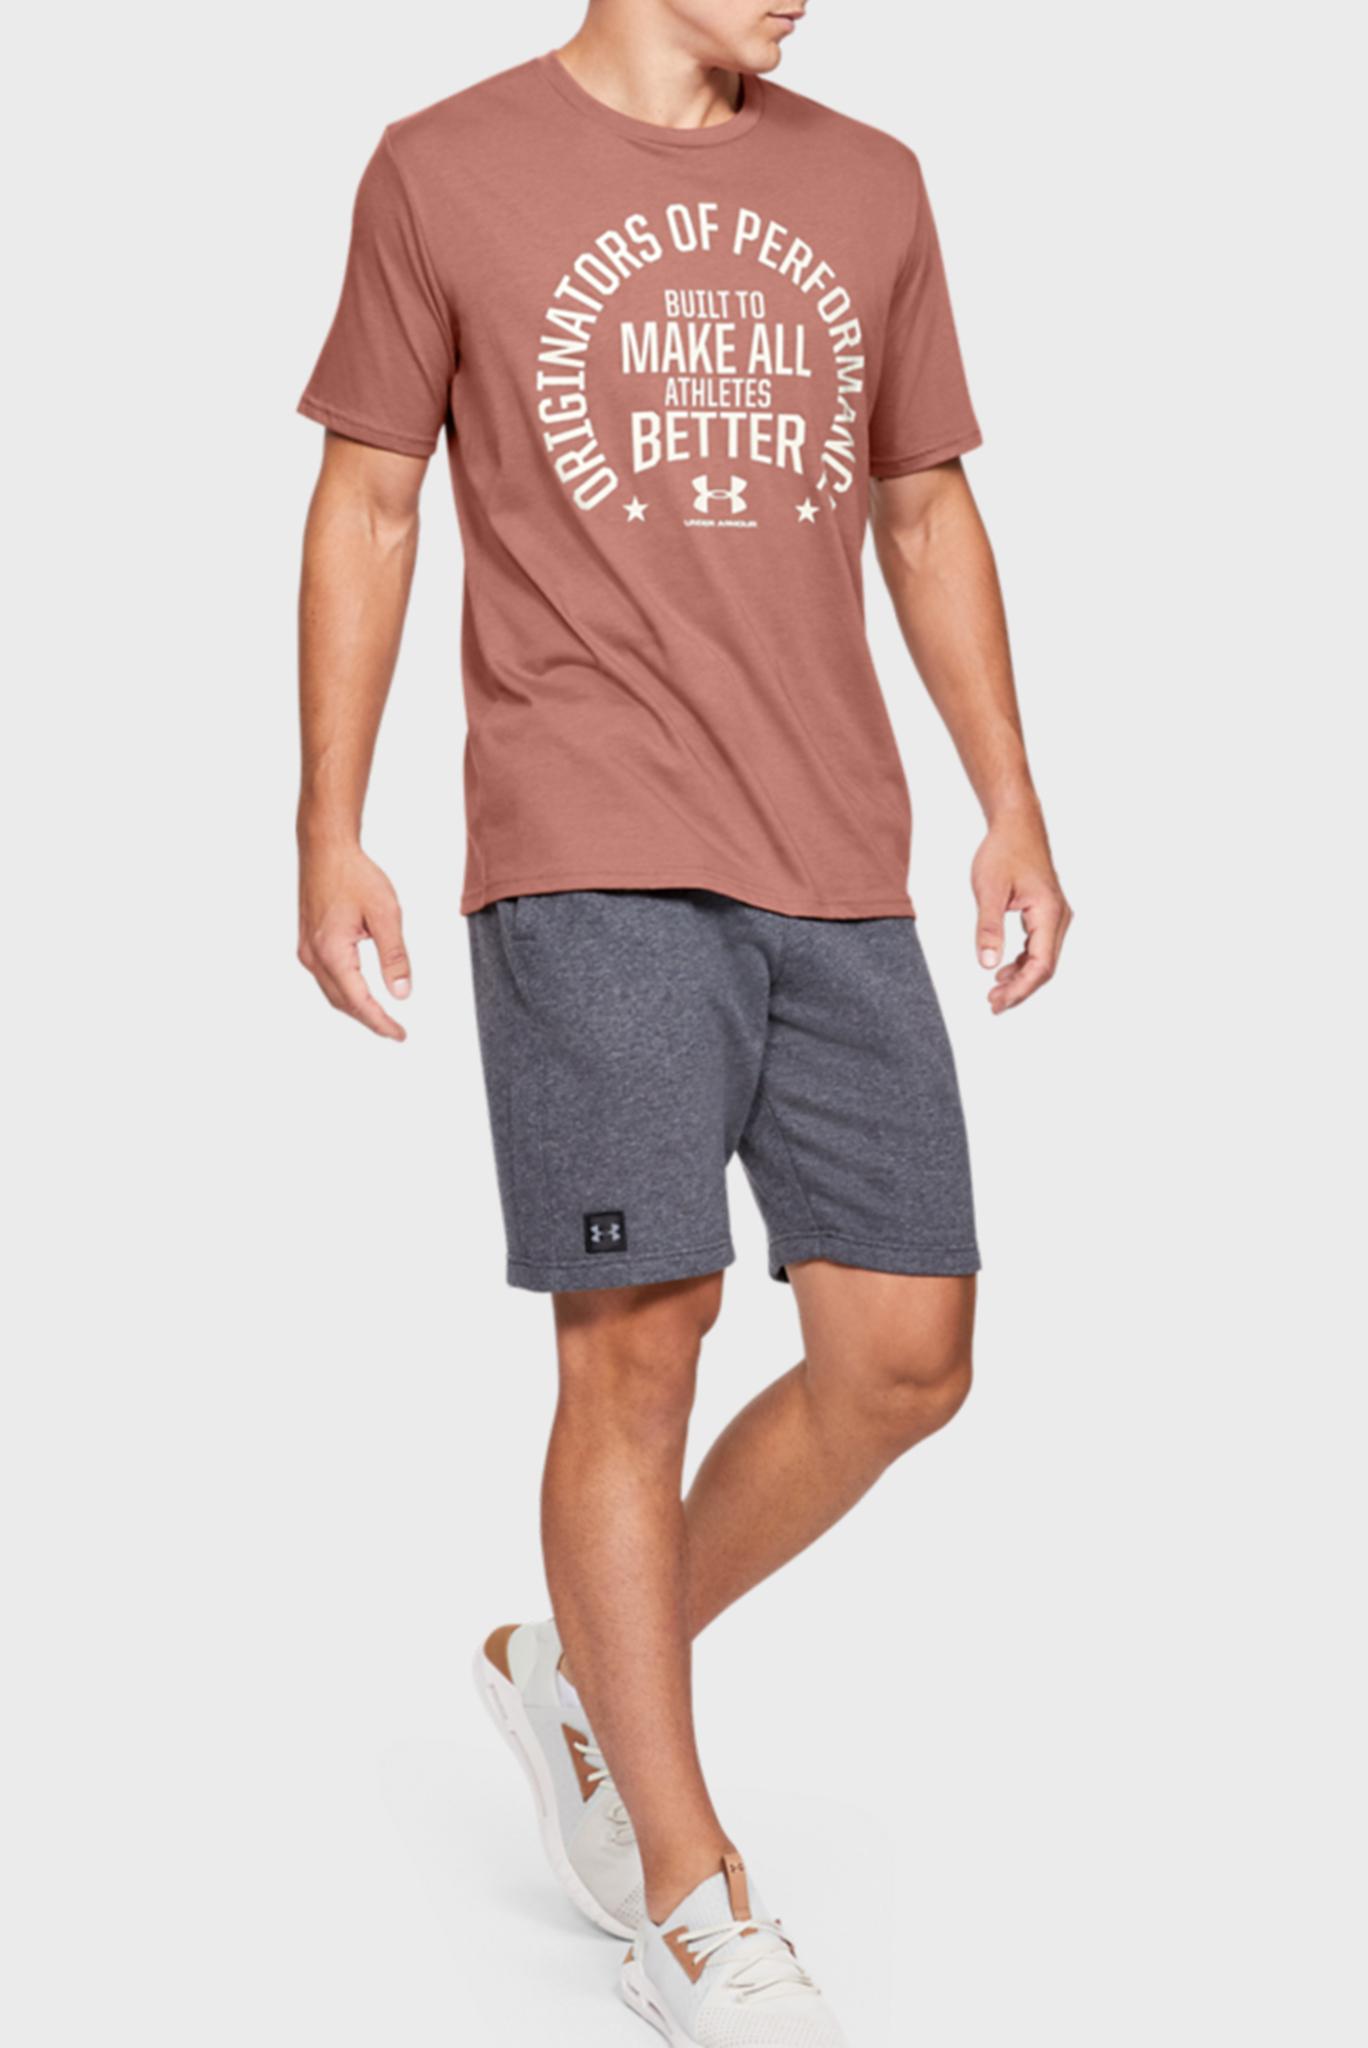 Мужская коричневая футболка UA PERF. ORIGIN MISSION SS-BRN Under Armour